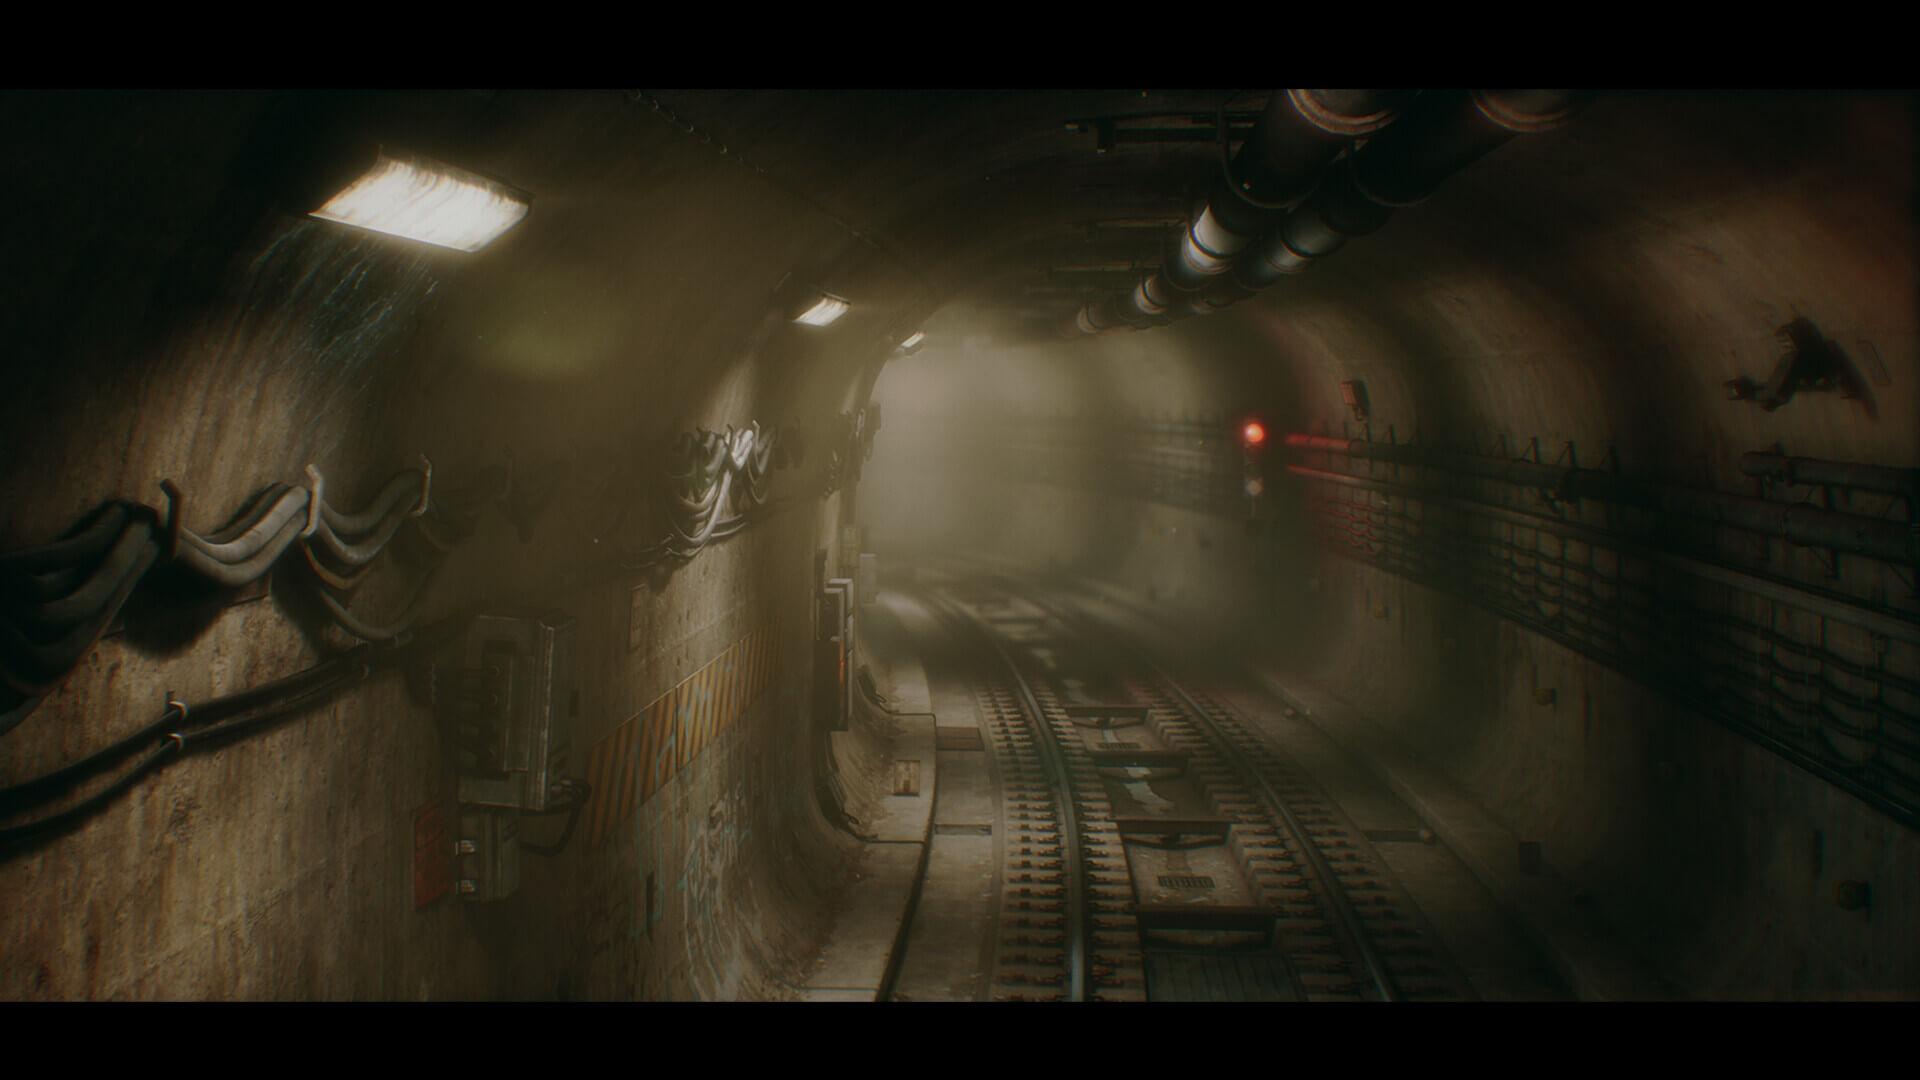 dekogon studios subwaytunnel screenshot07 - 【画像】『PS5』世代のゲームはこんな感じのグラフィックになるらしい